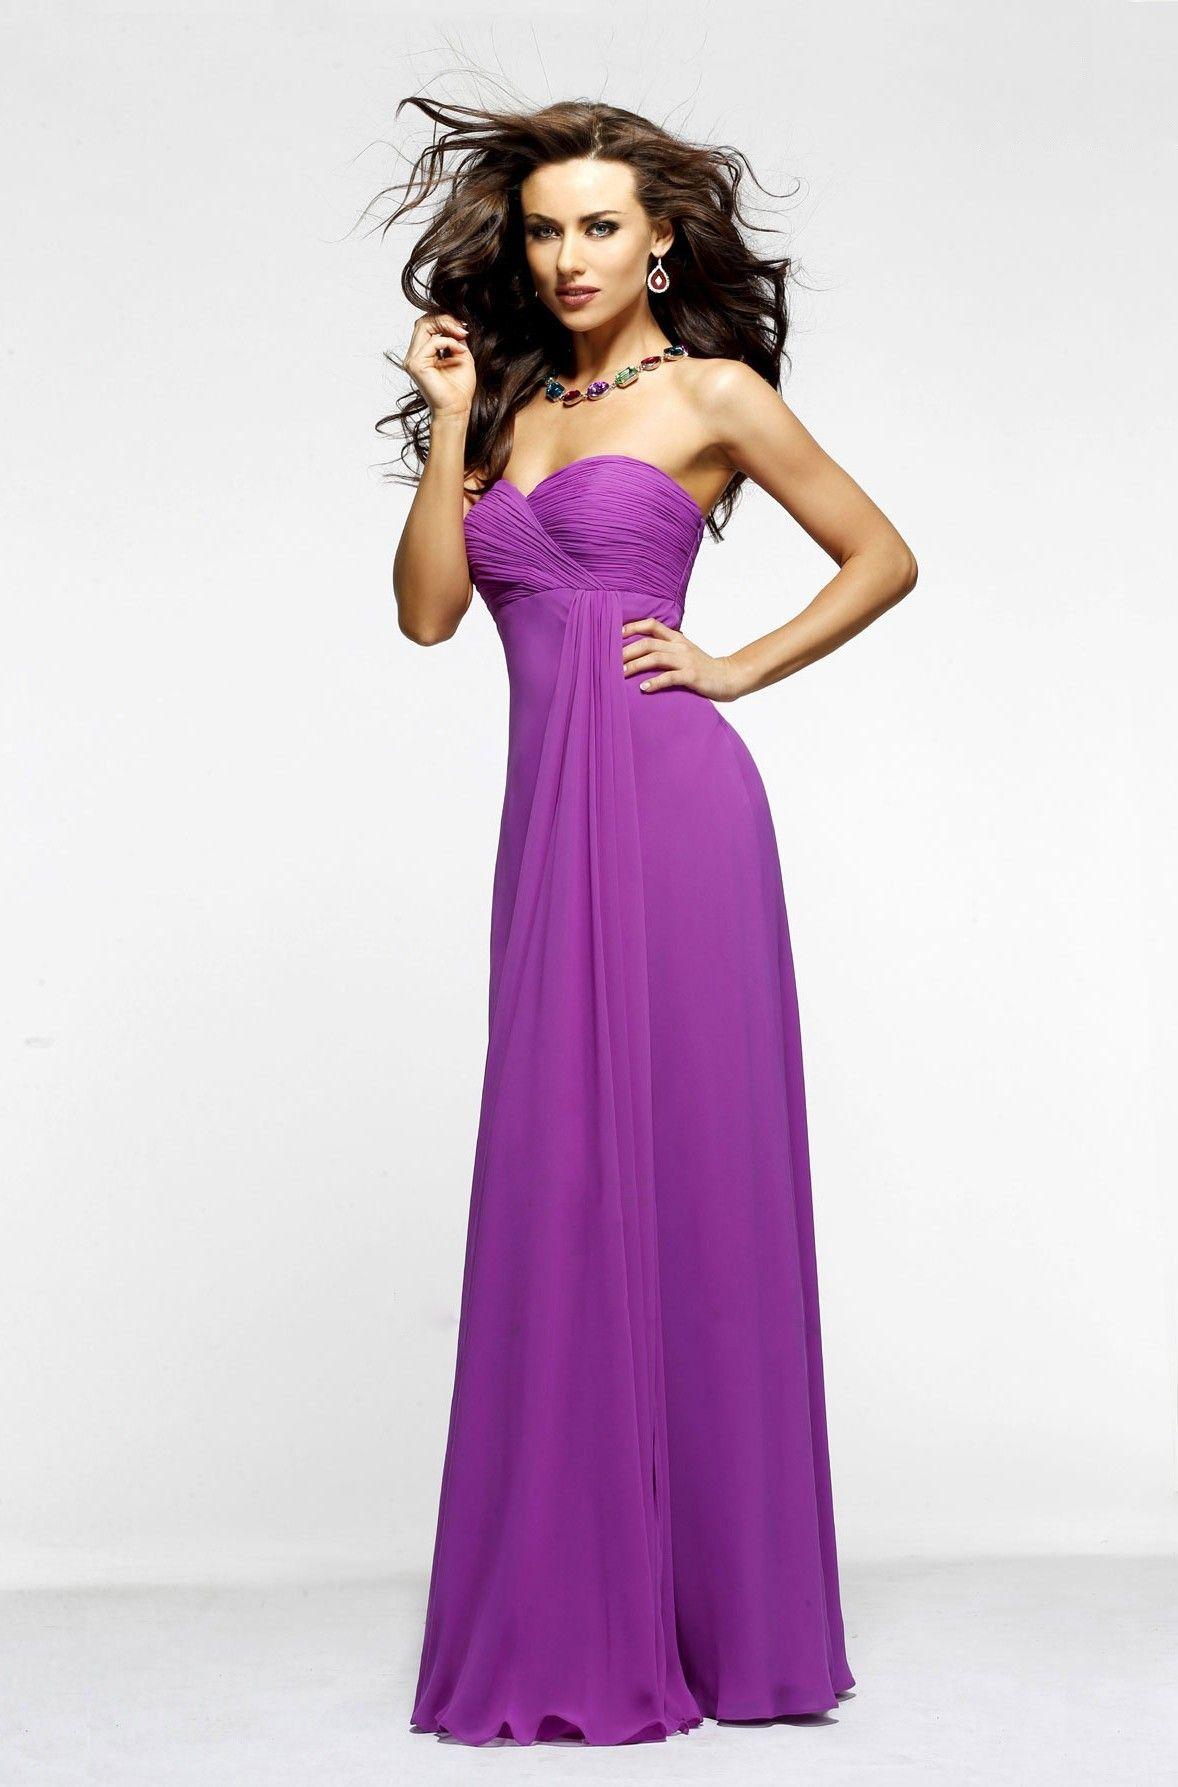 Simple A-line Sweetheart Ruching Floor-length Chiffon Wedding Guest Dresses $209.99 Wedding Guest Dresses